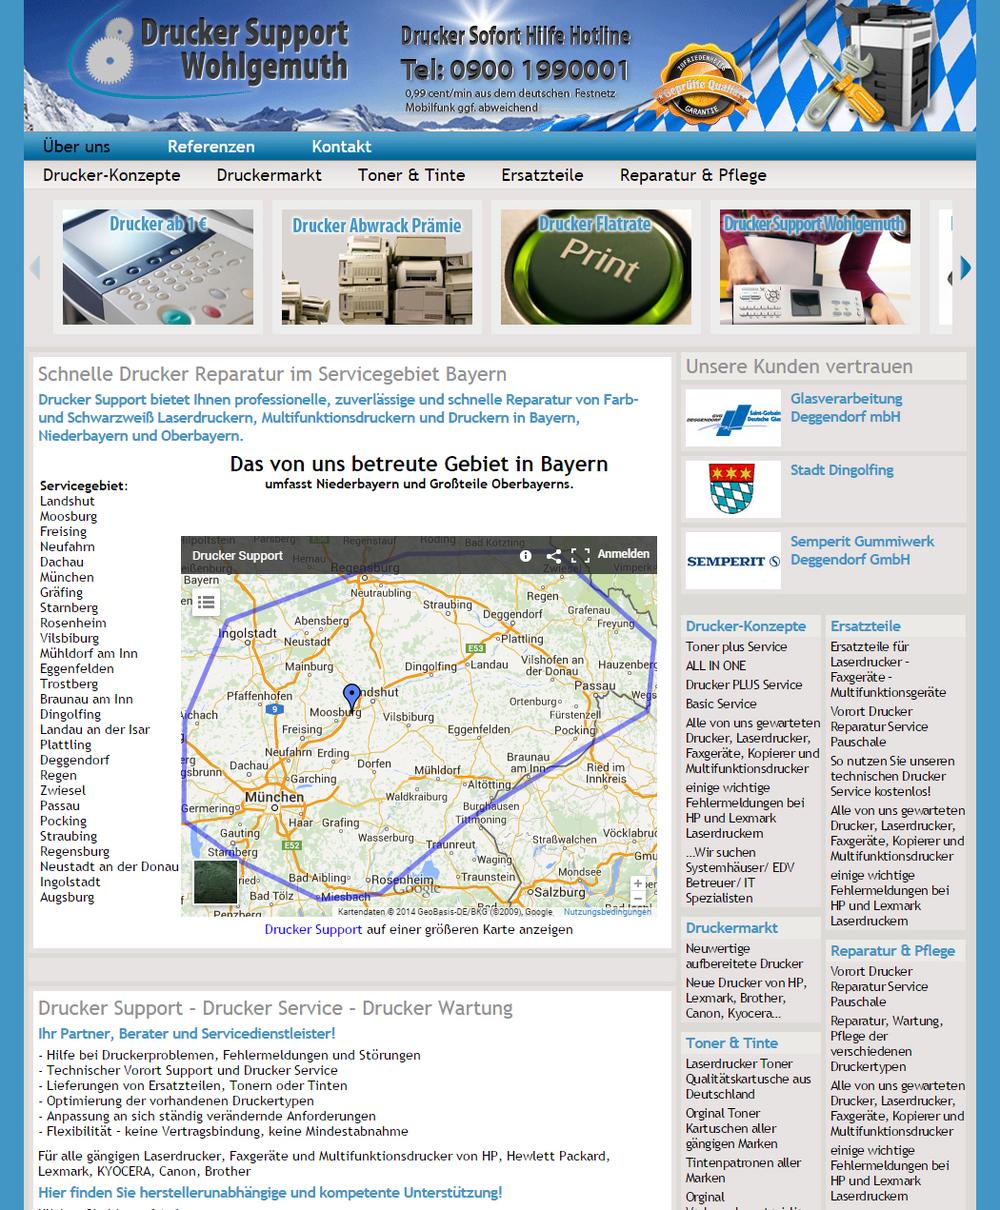 Drucker Support Website.jpg